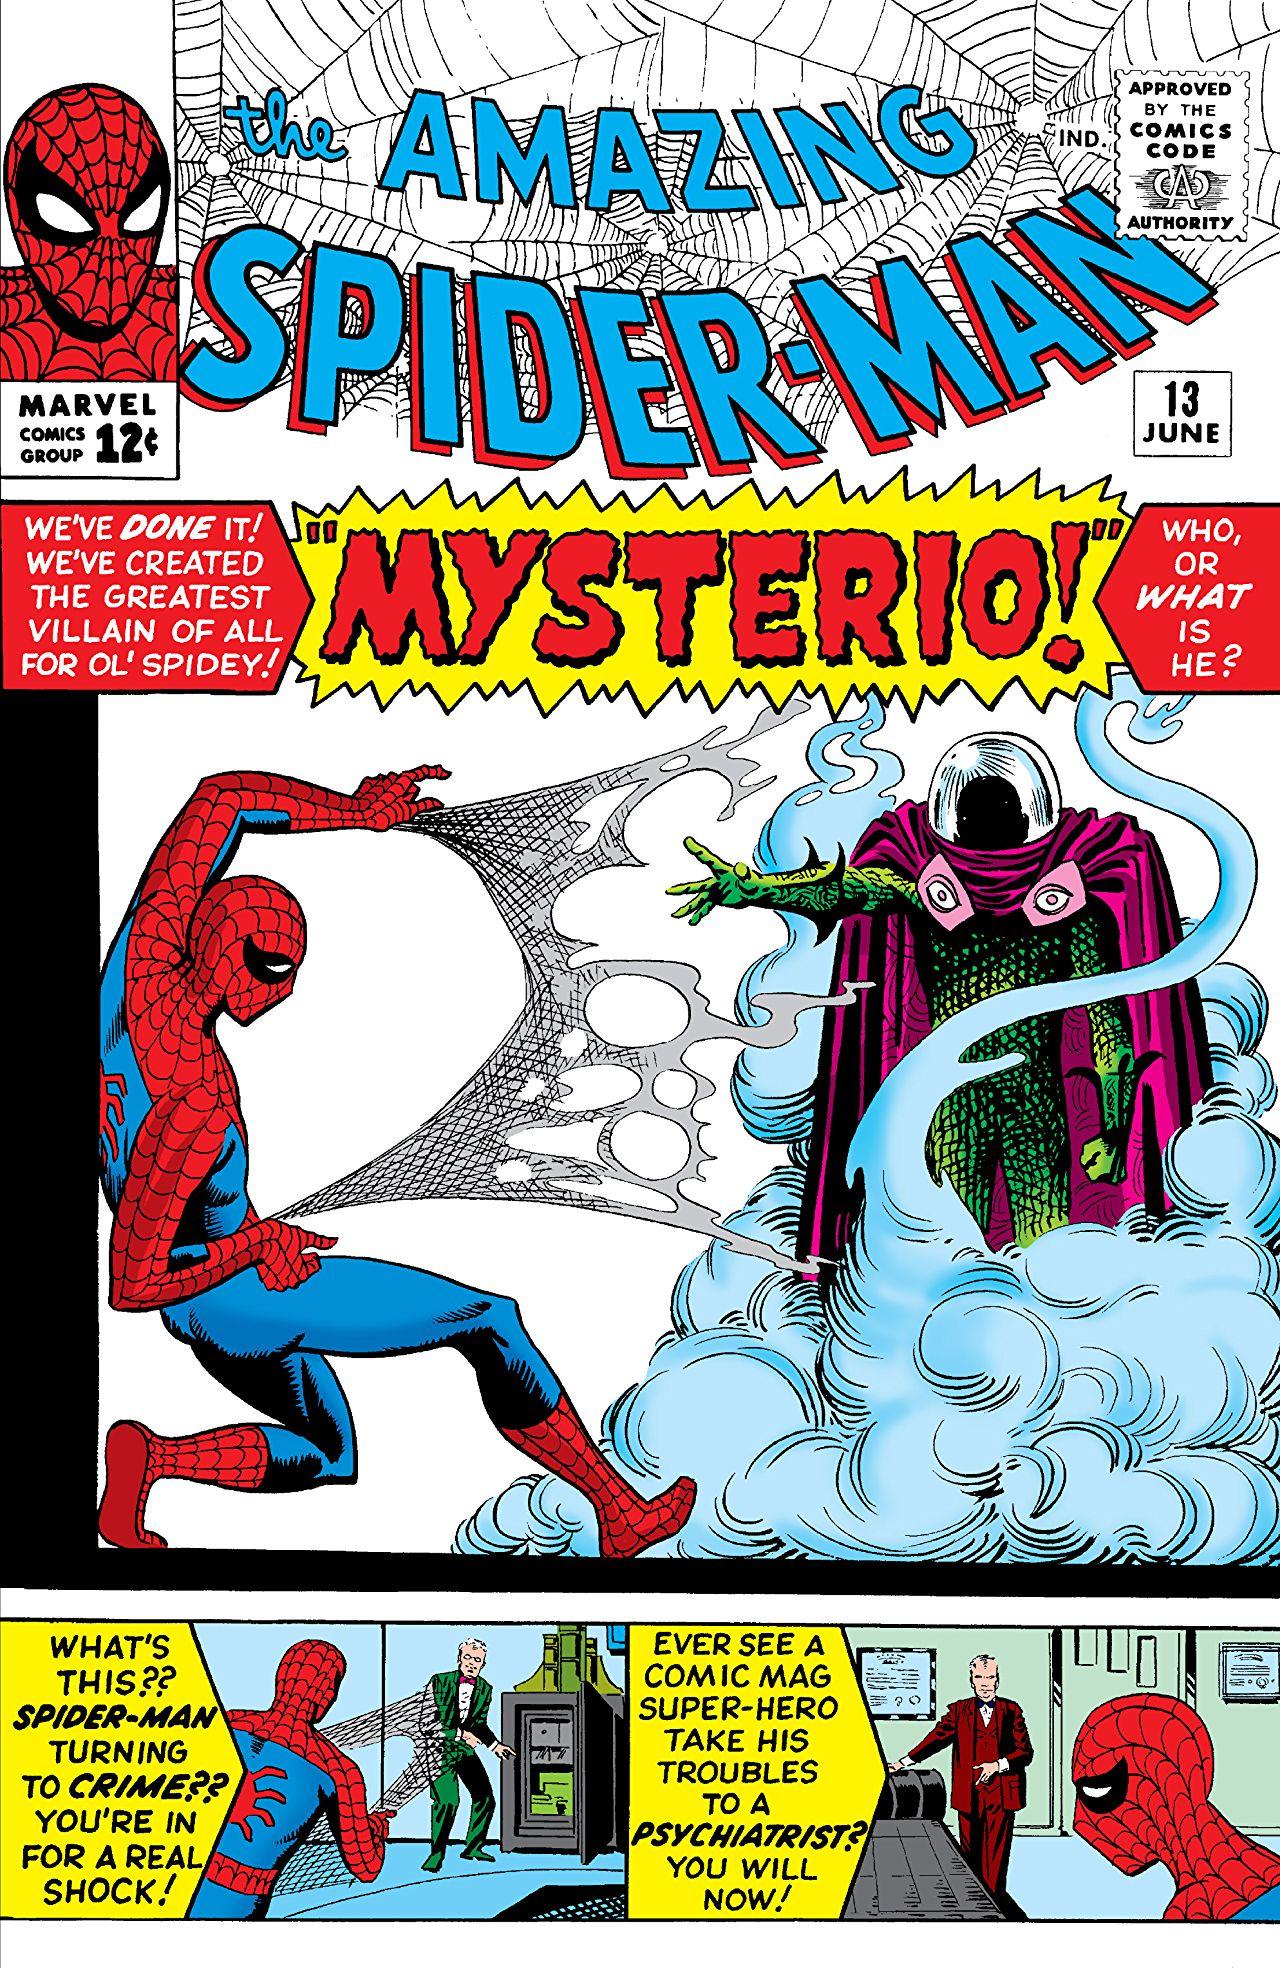 The Amazing Spider-Man #12 (1963)